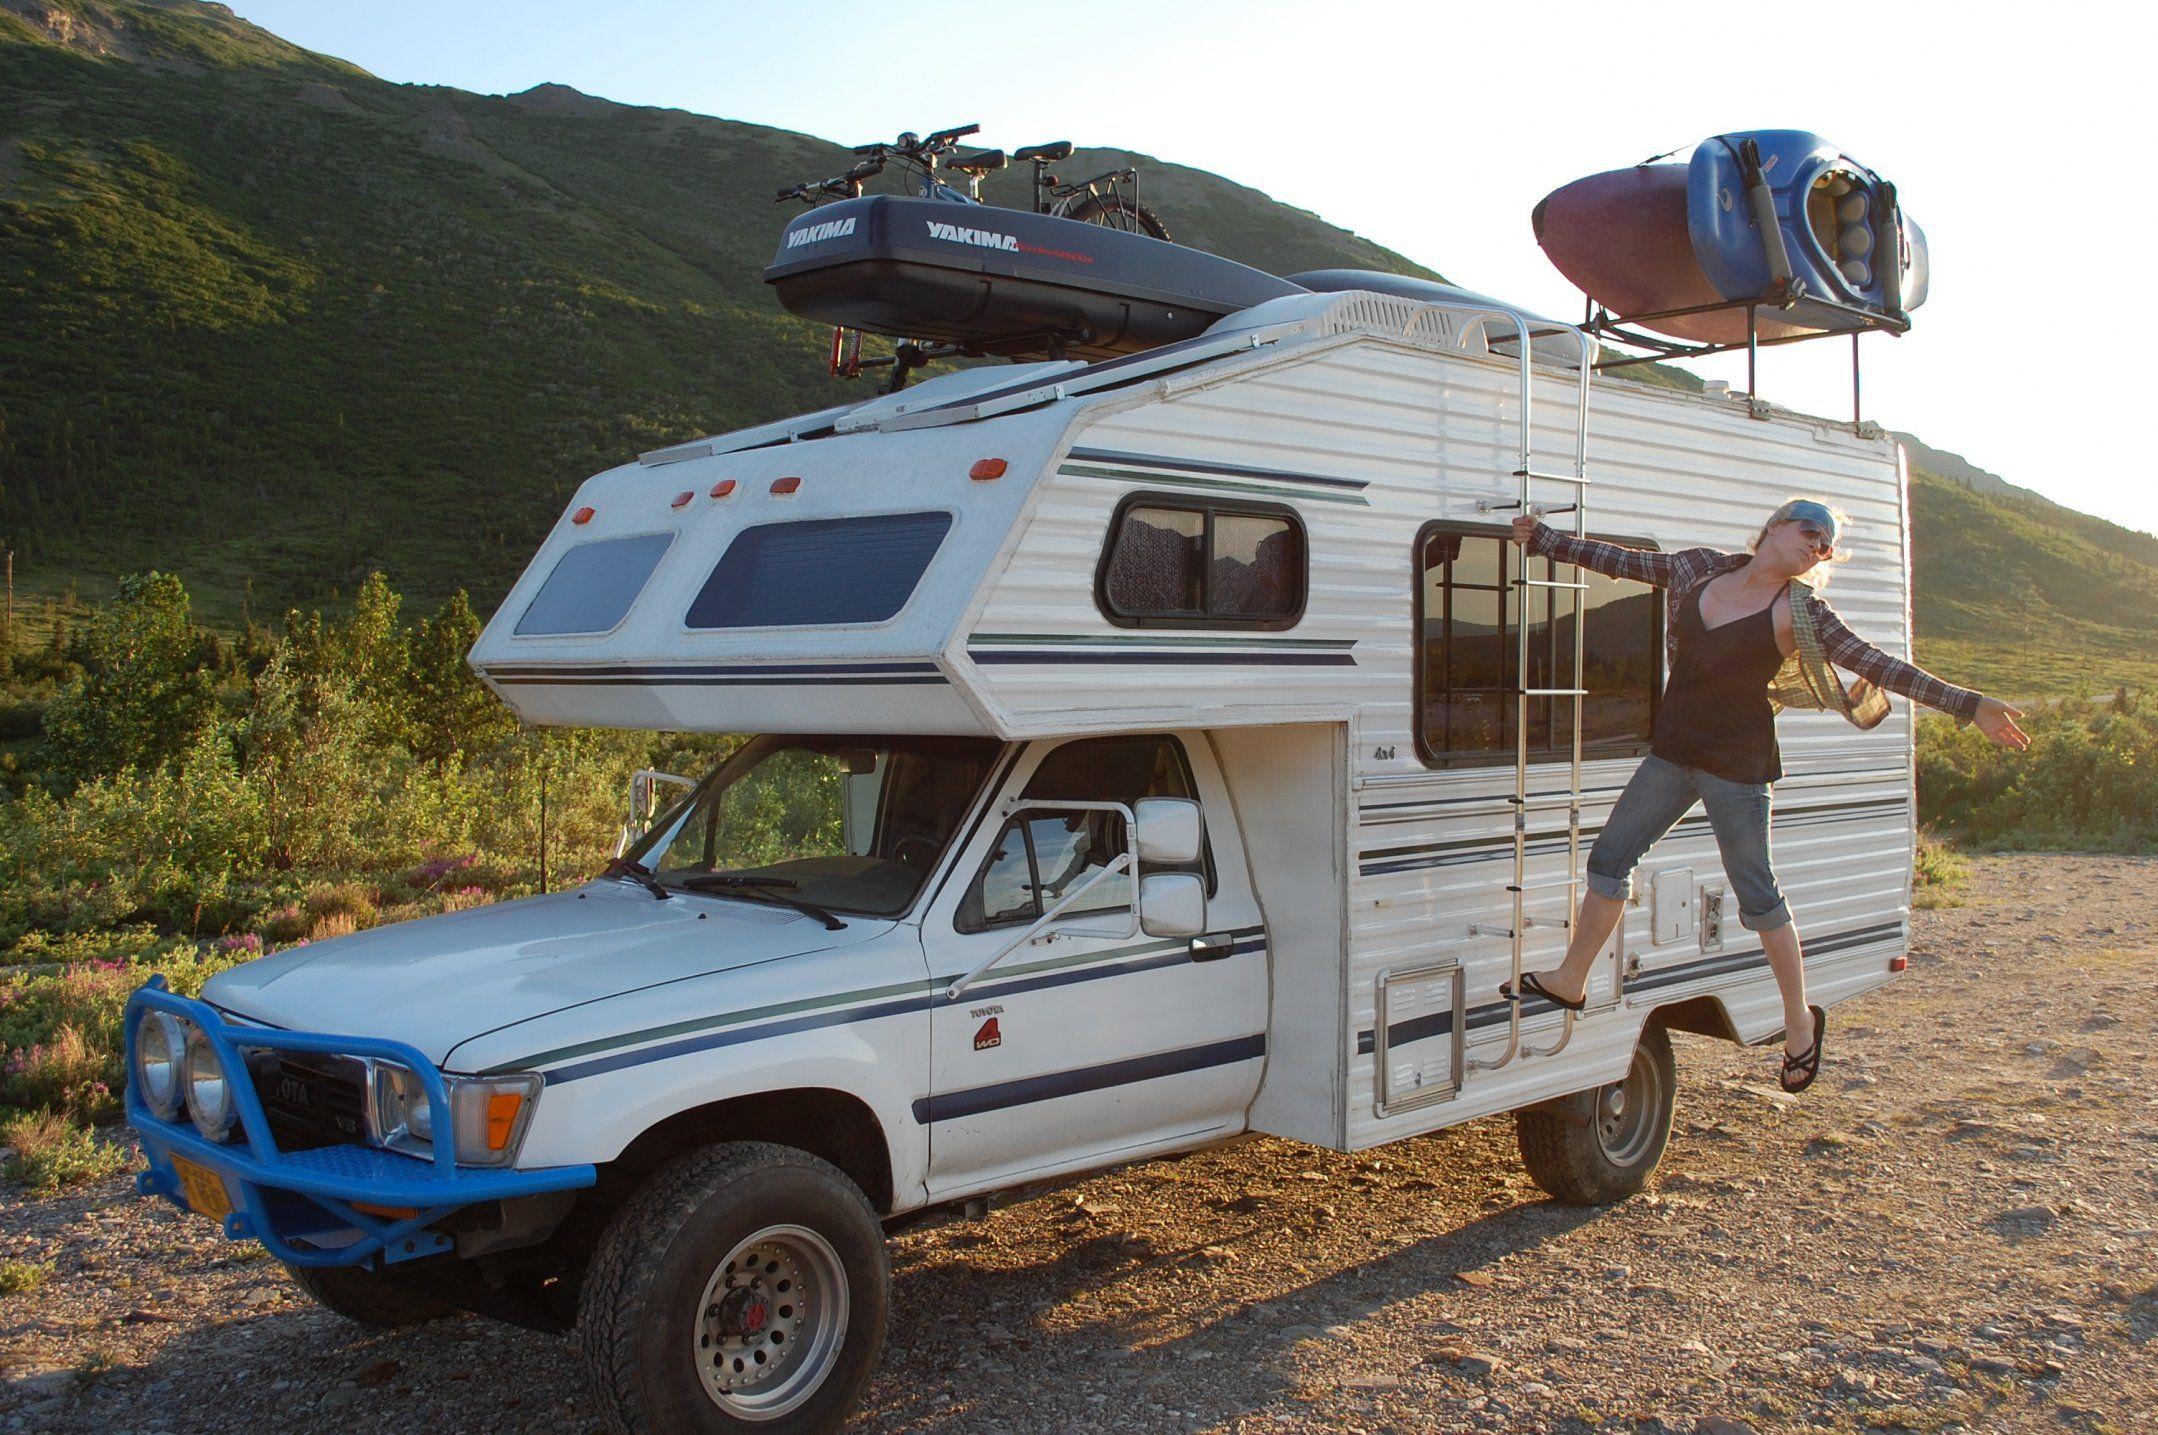 Retro Mobile Homes Toyota Odyssey Rv 4x4 Truck Campers Pinterest 4x4 Toyota